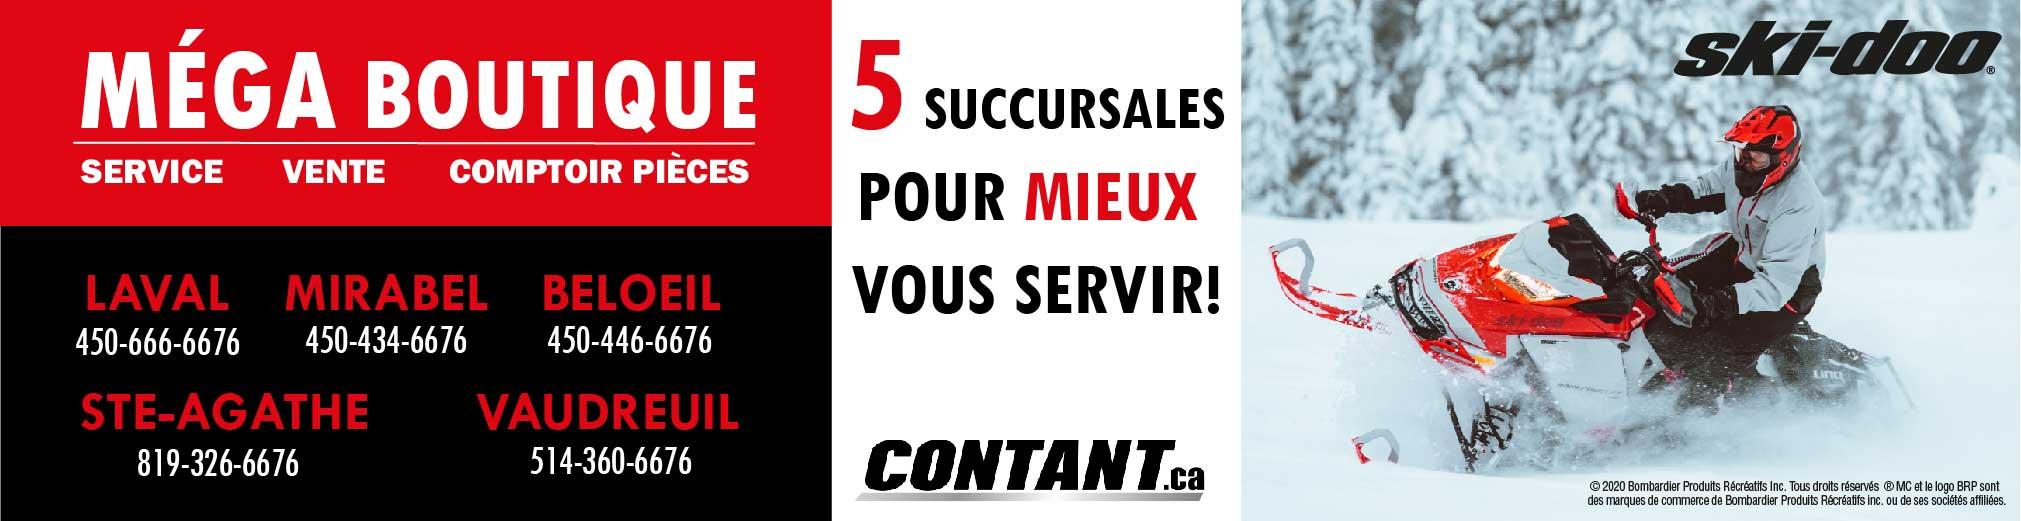 Groupe Contant - Motoneige